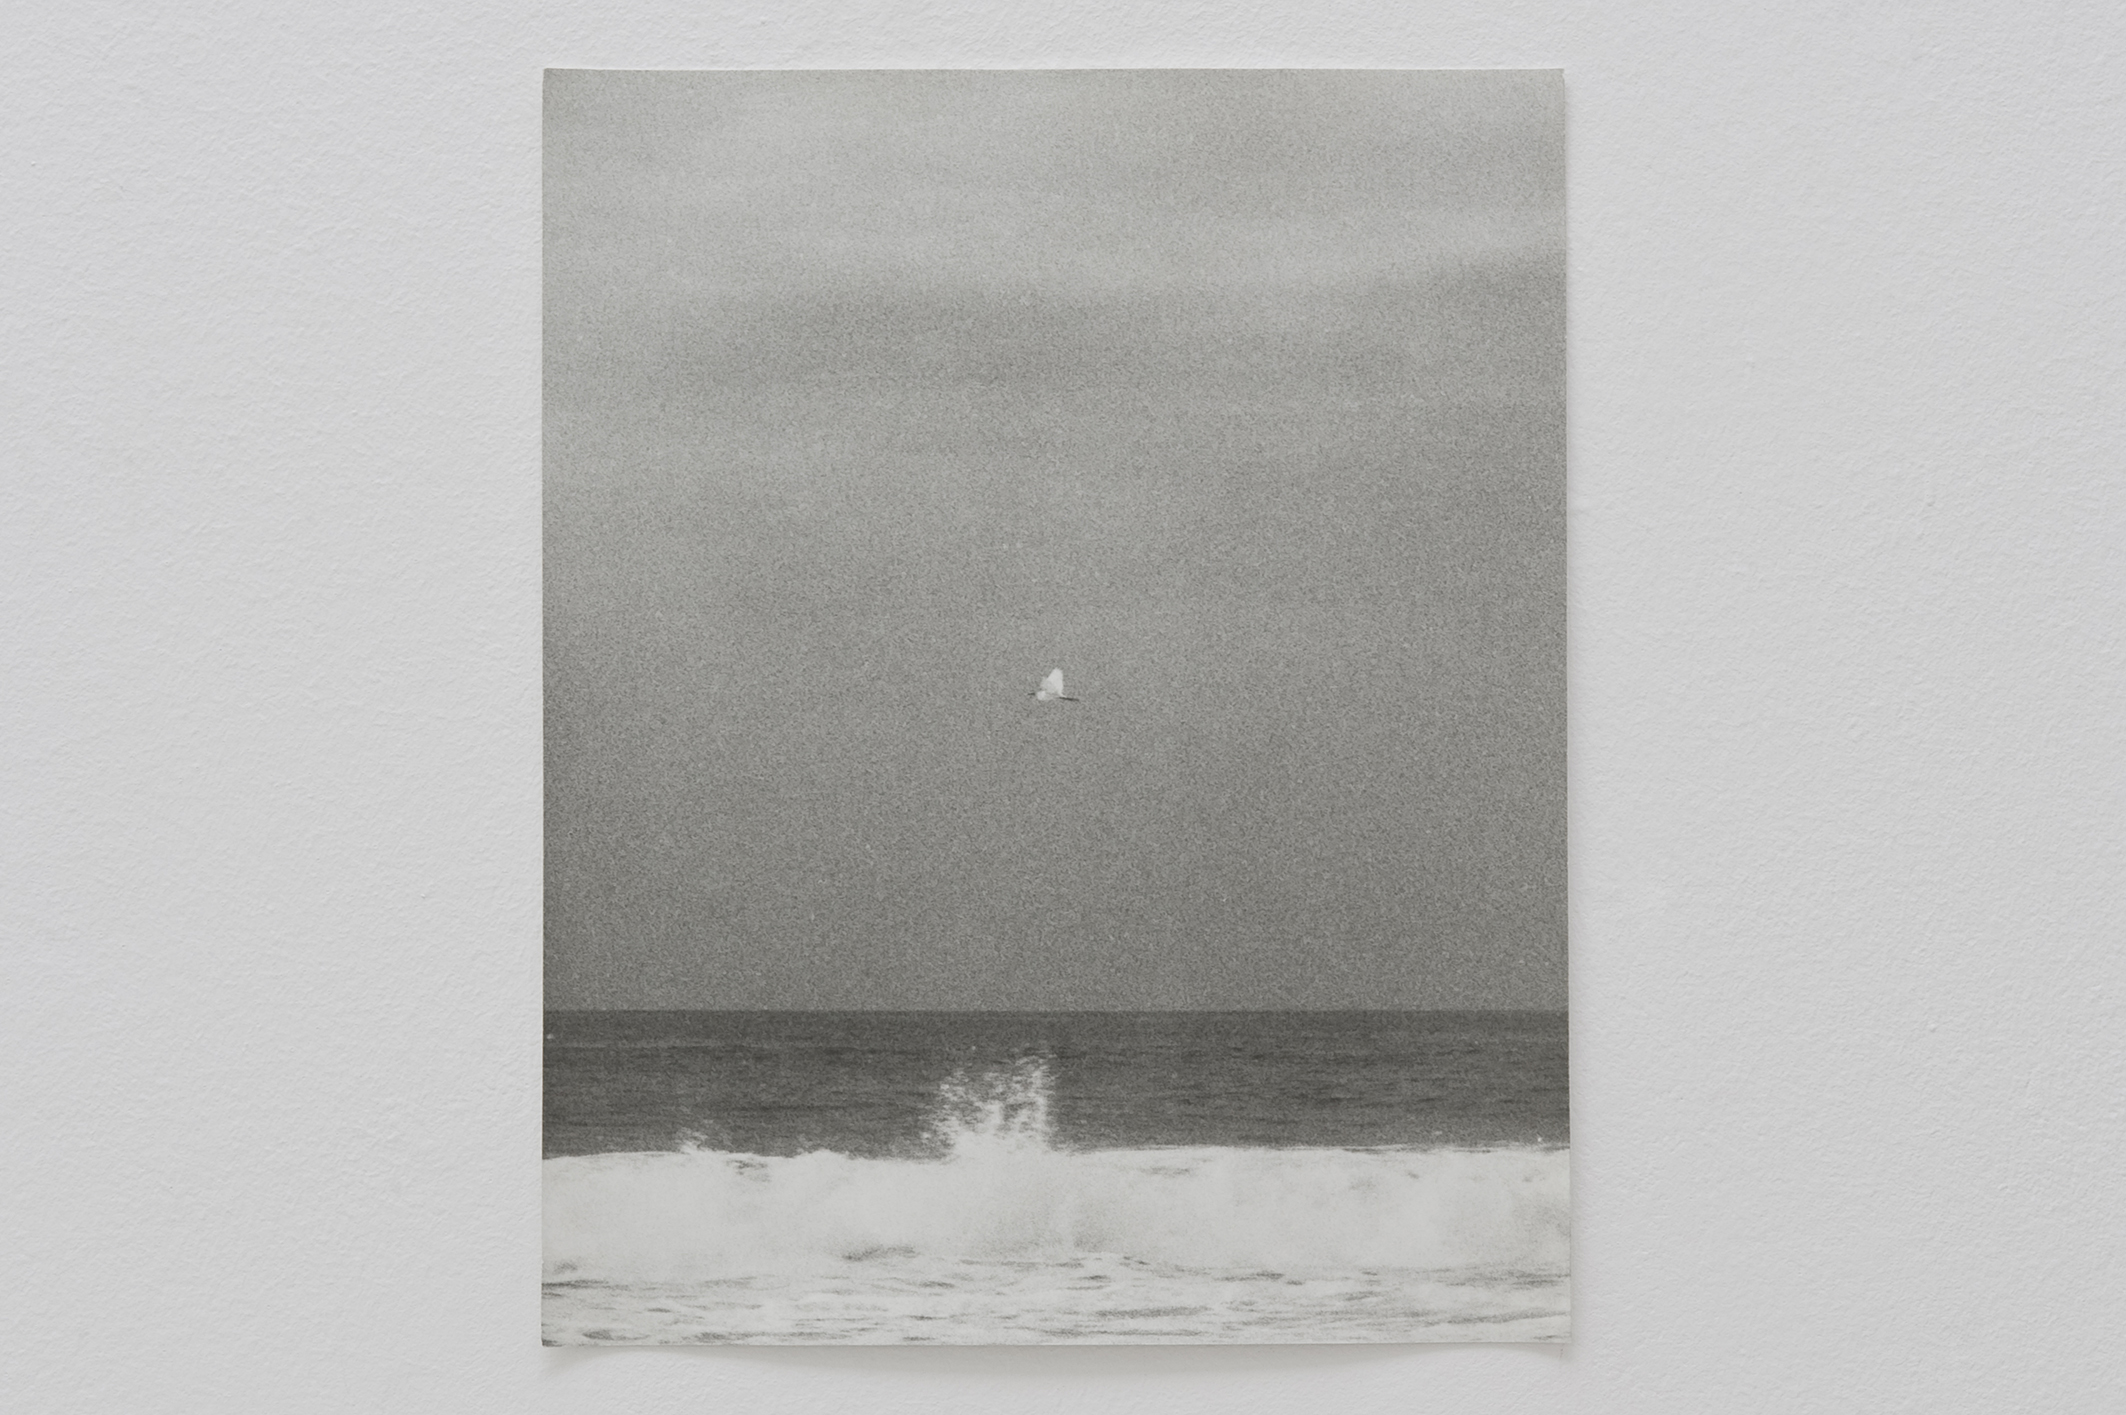 Untitled (Egretta), 2014 | Jochen Lempert | ProjecteSD